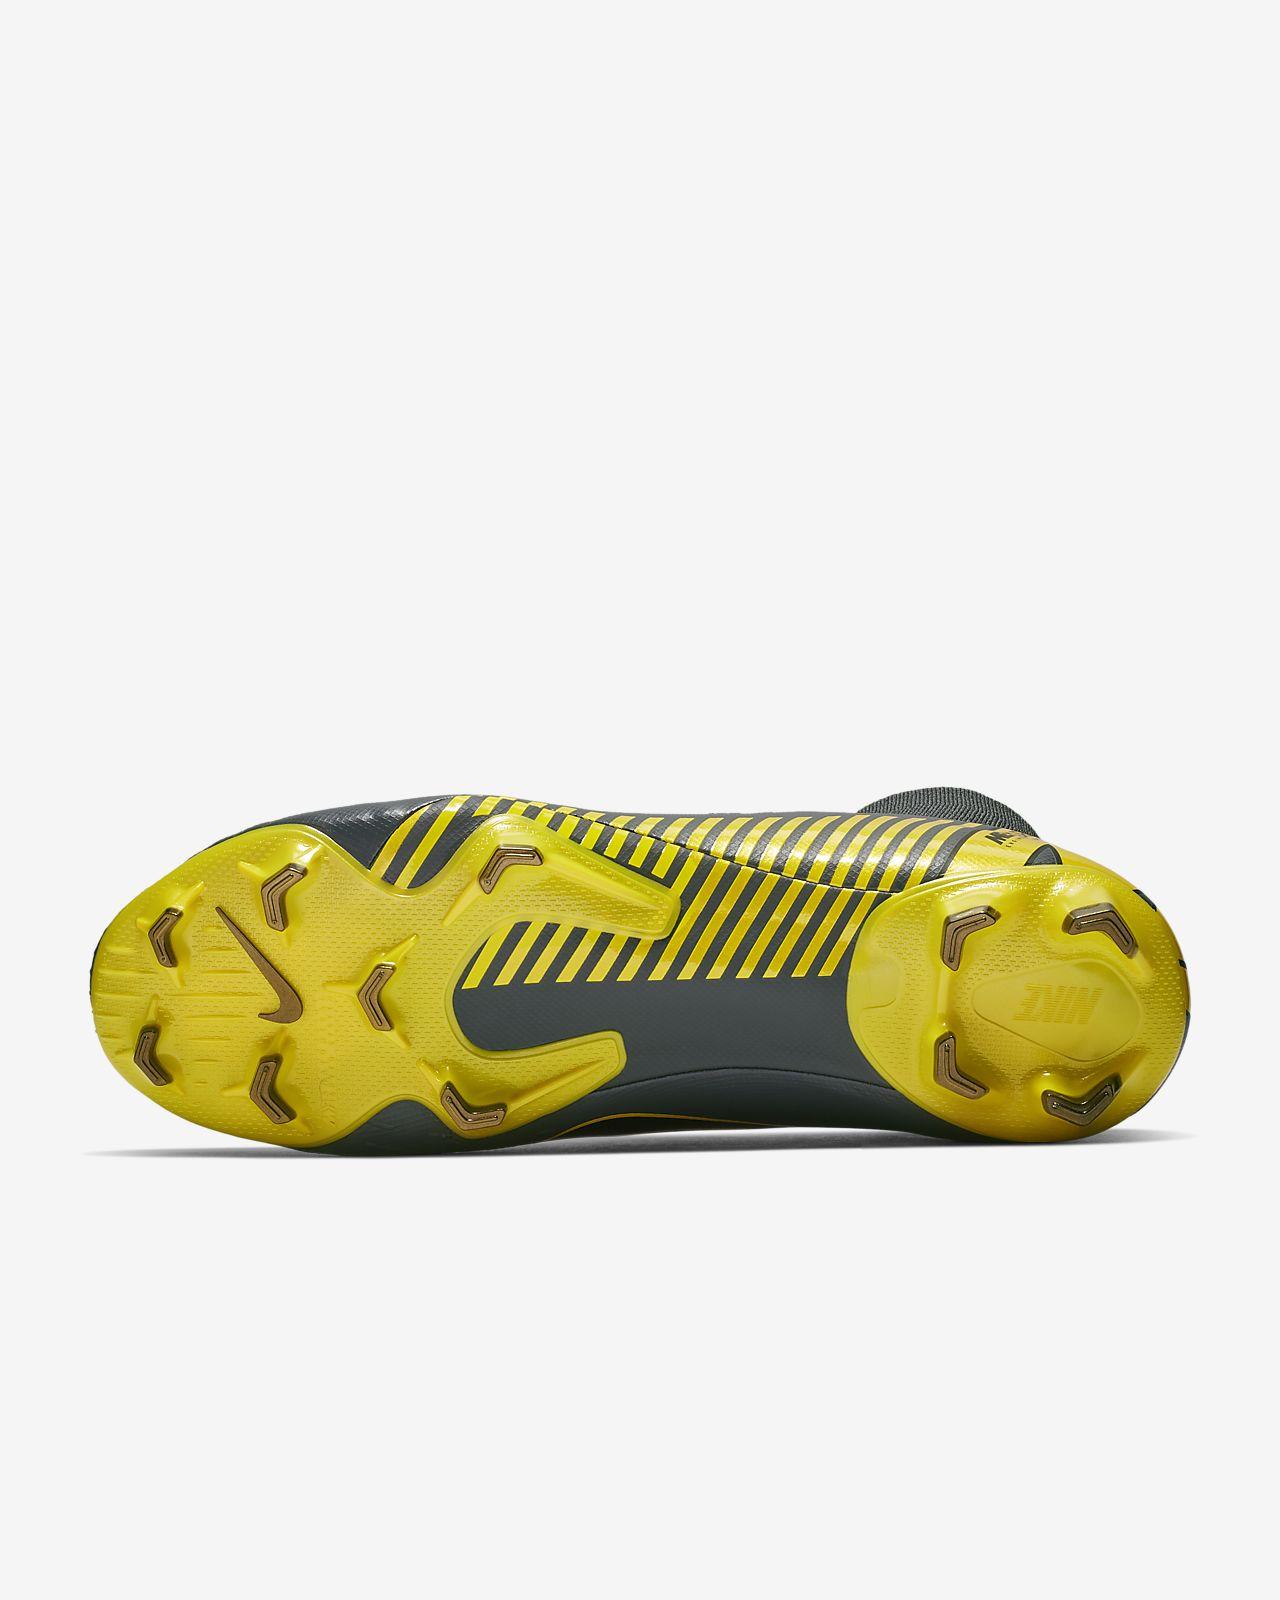 7b2f85a2b4f2 Nike Superfly 6 Pro FG Firm-Ground Football Boot. Nike.com NZ